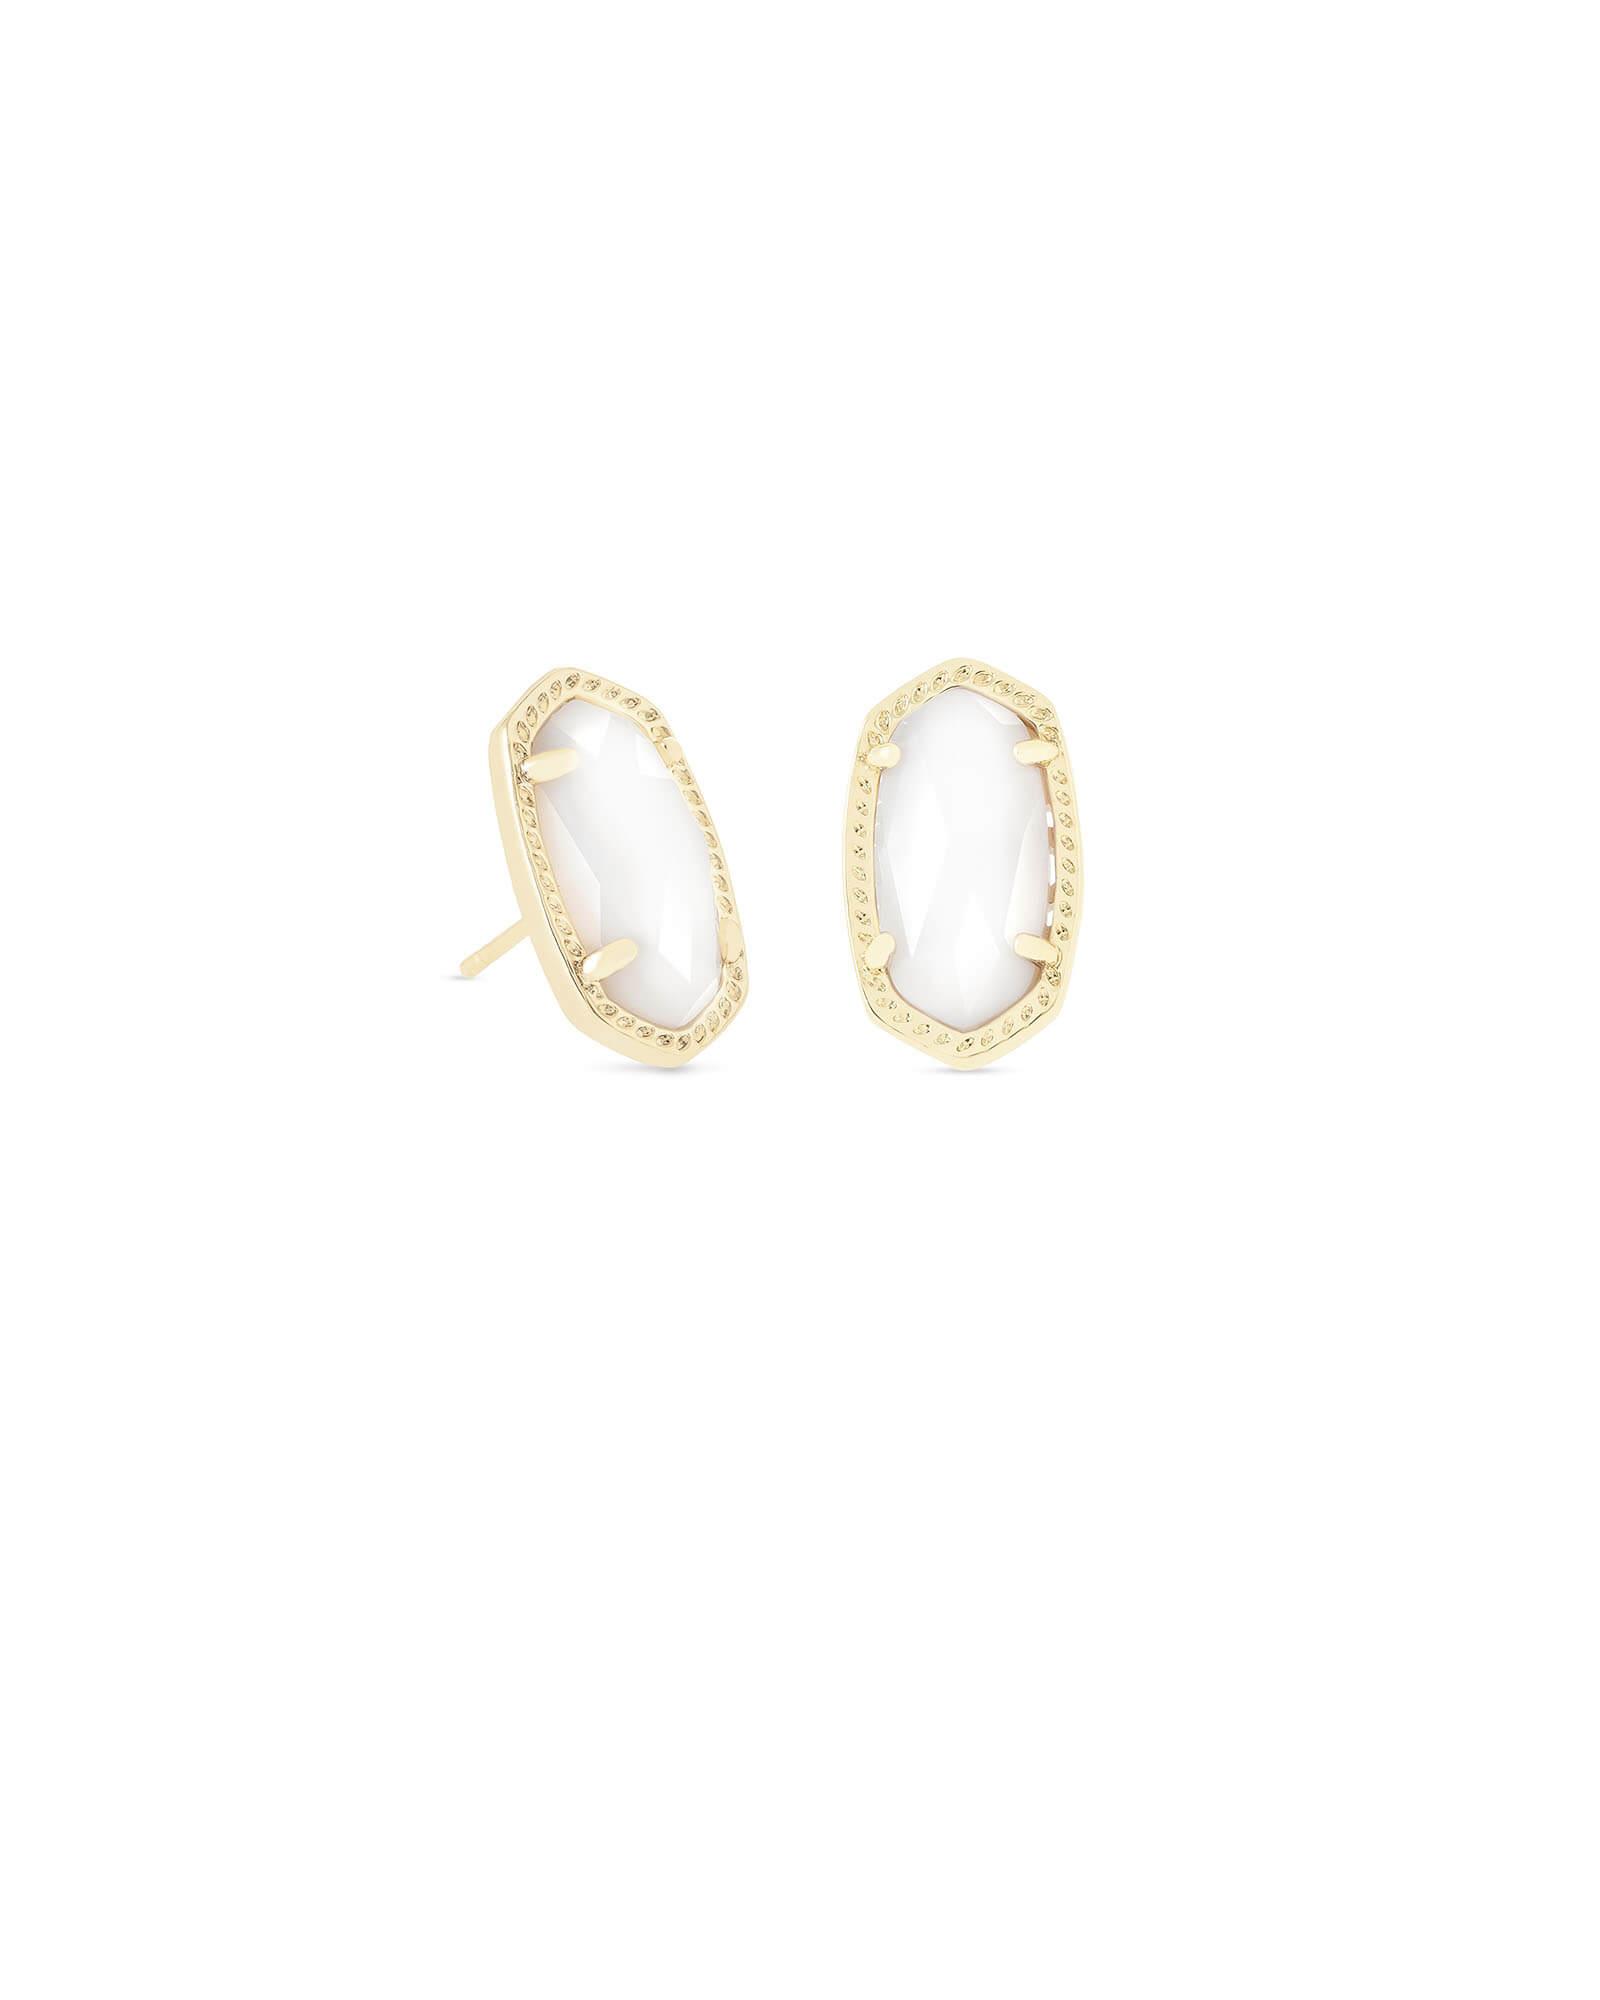 0c3290d74 Ellie Gold Stud Earrings in White Pearl | Kendra Scott